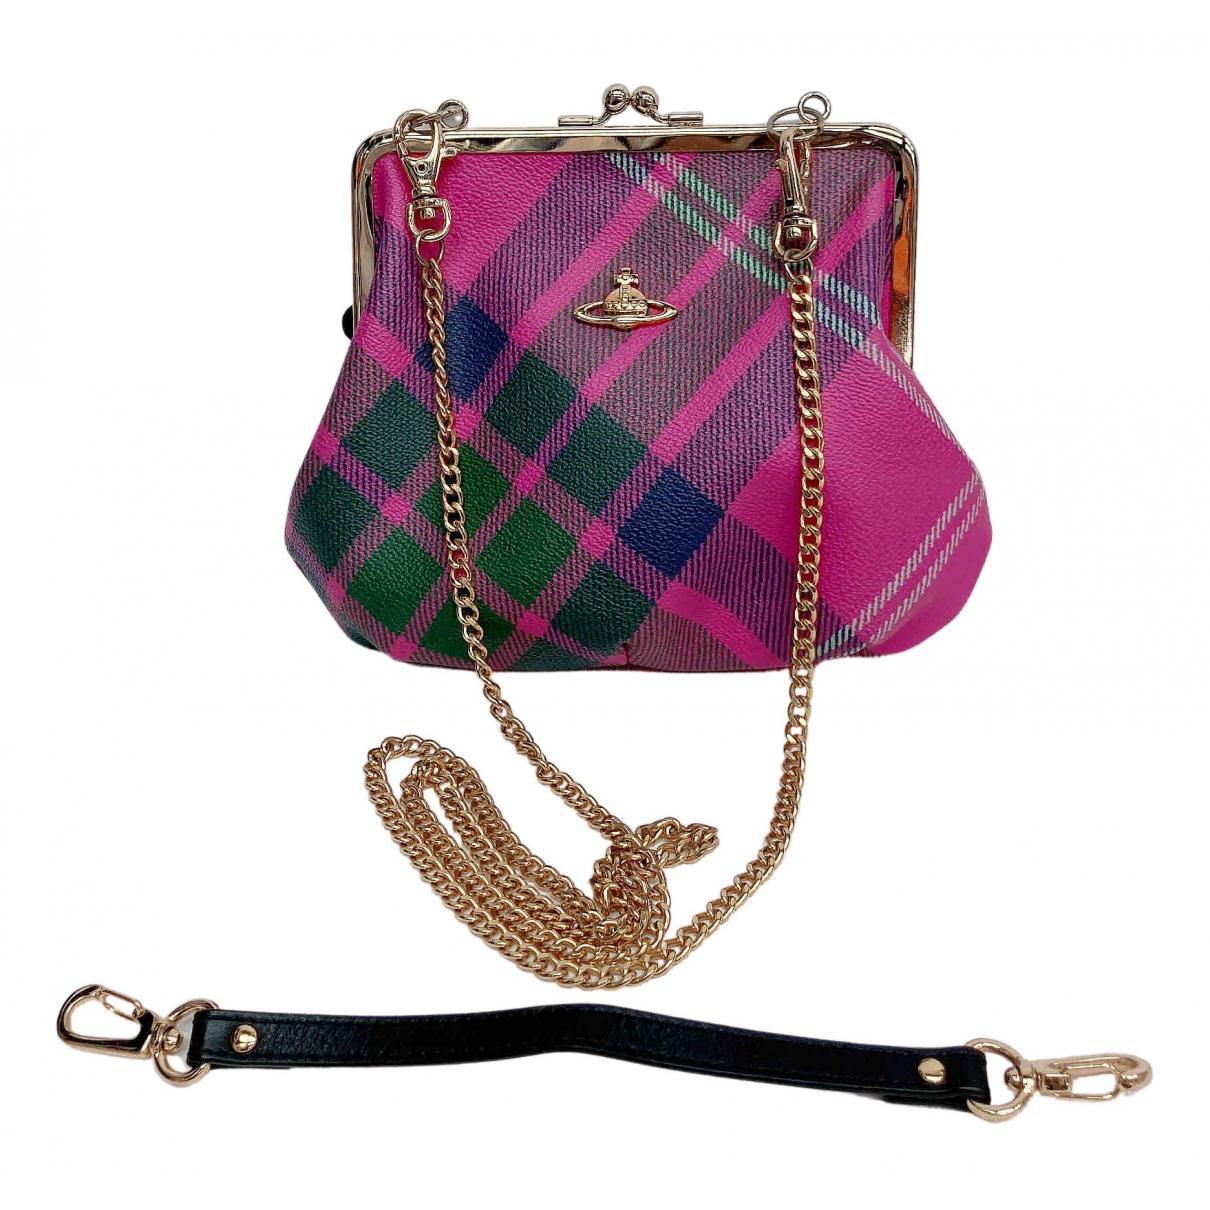 Vivienne Westwood N Multicolour Cloth handbag for Women N